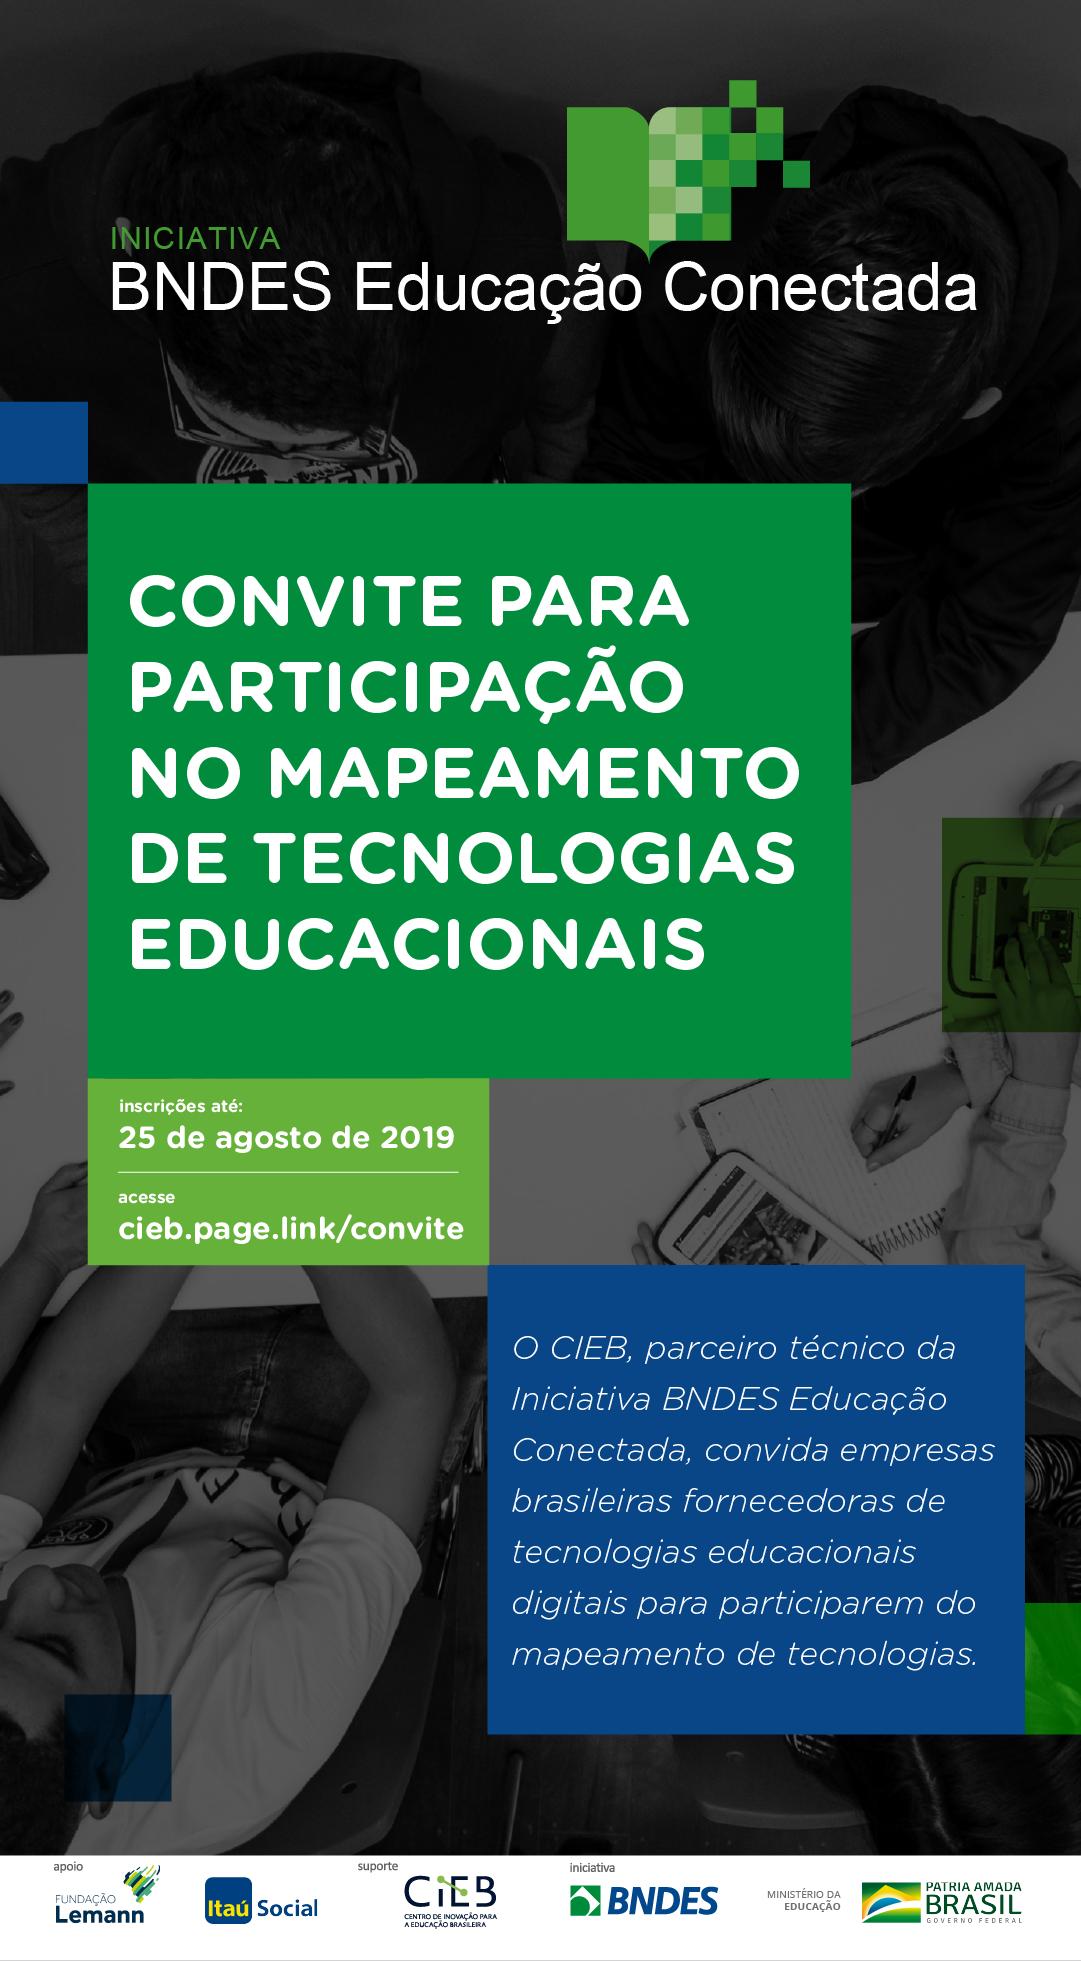 CIEB convida empresas a participar de mapeamento de tecnologias educacionais